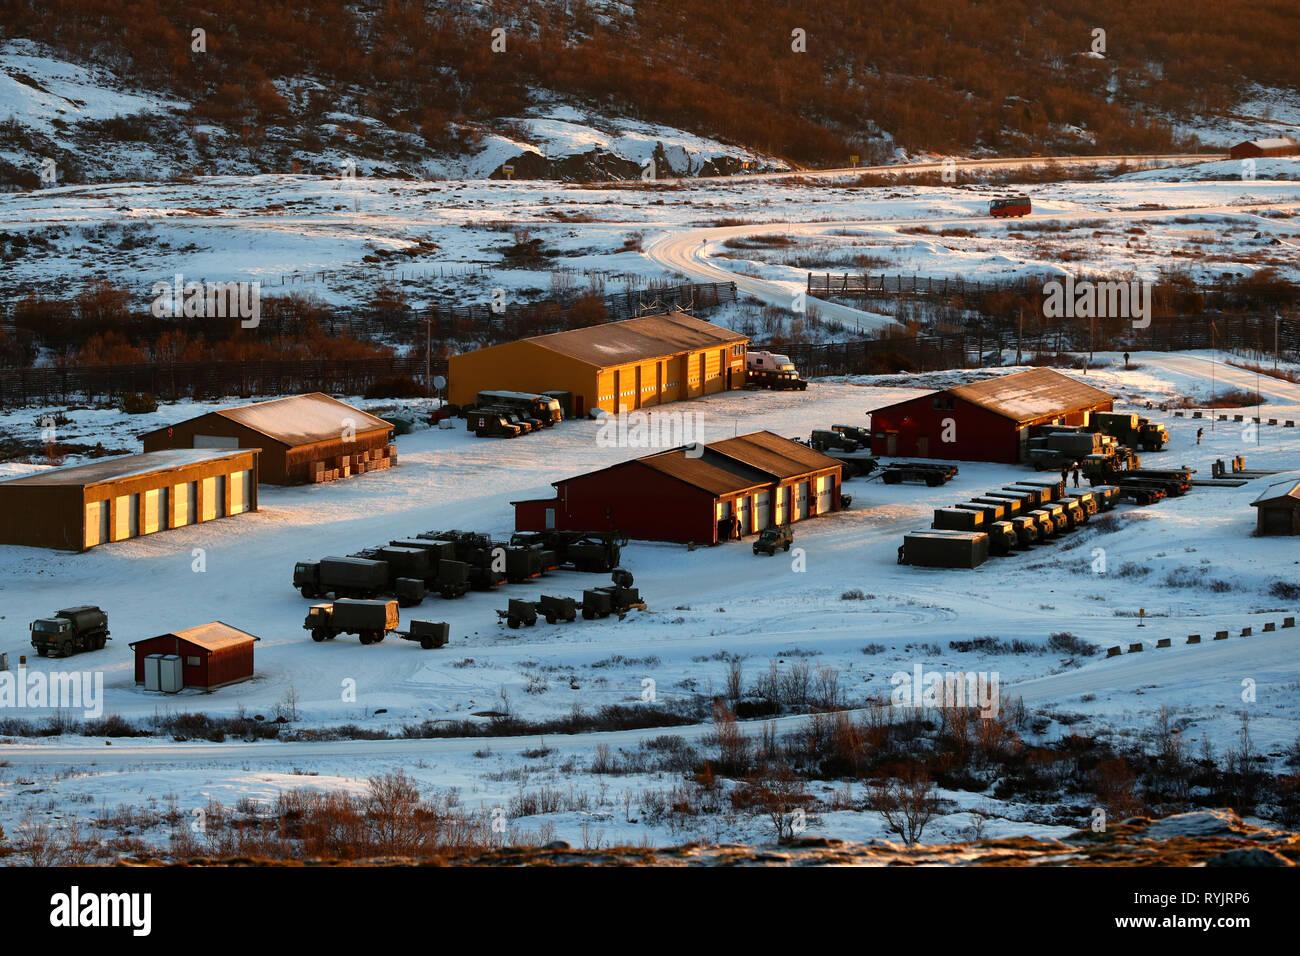 DovrefjellÐSunndalsfjella National Park.  NATO military base.  Norway. - Stock Image